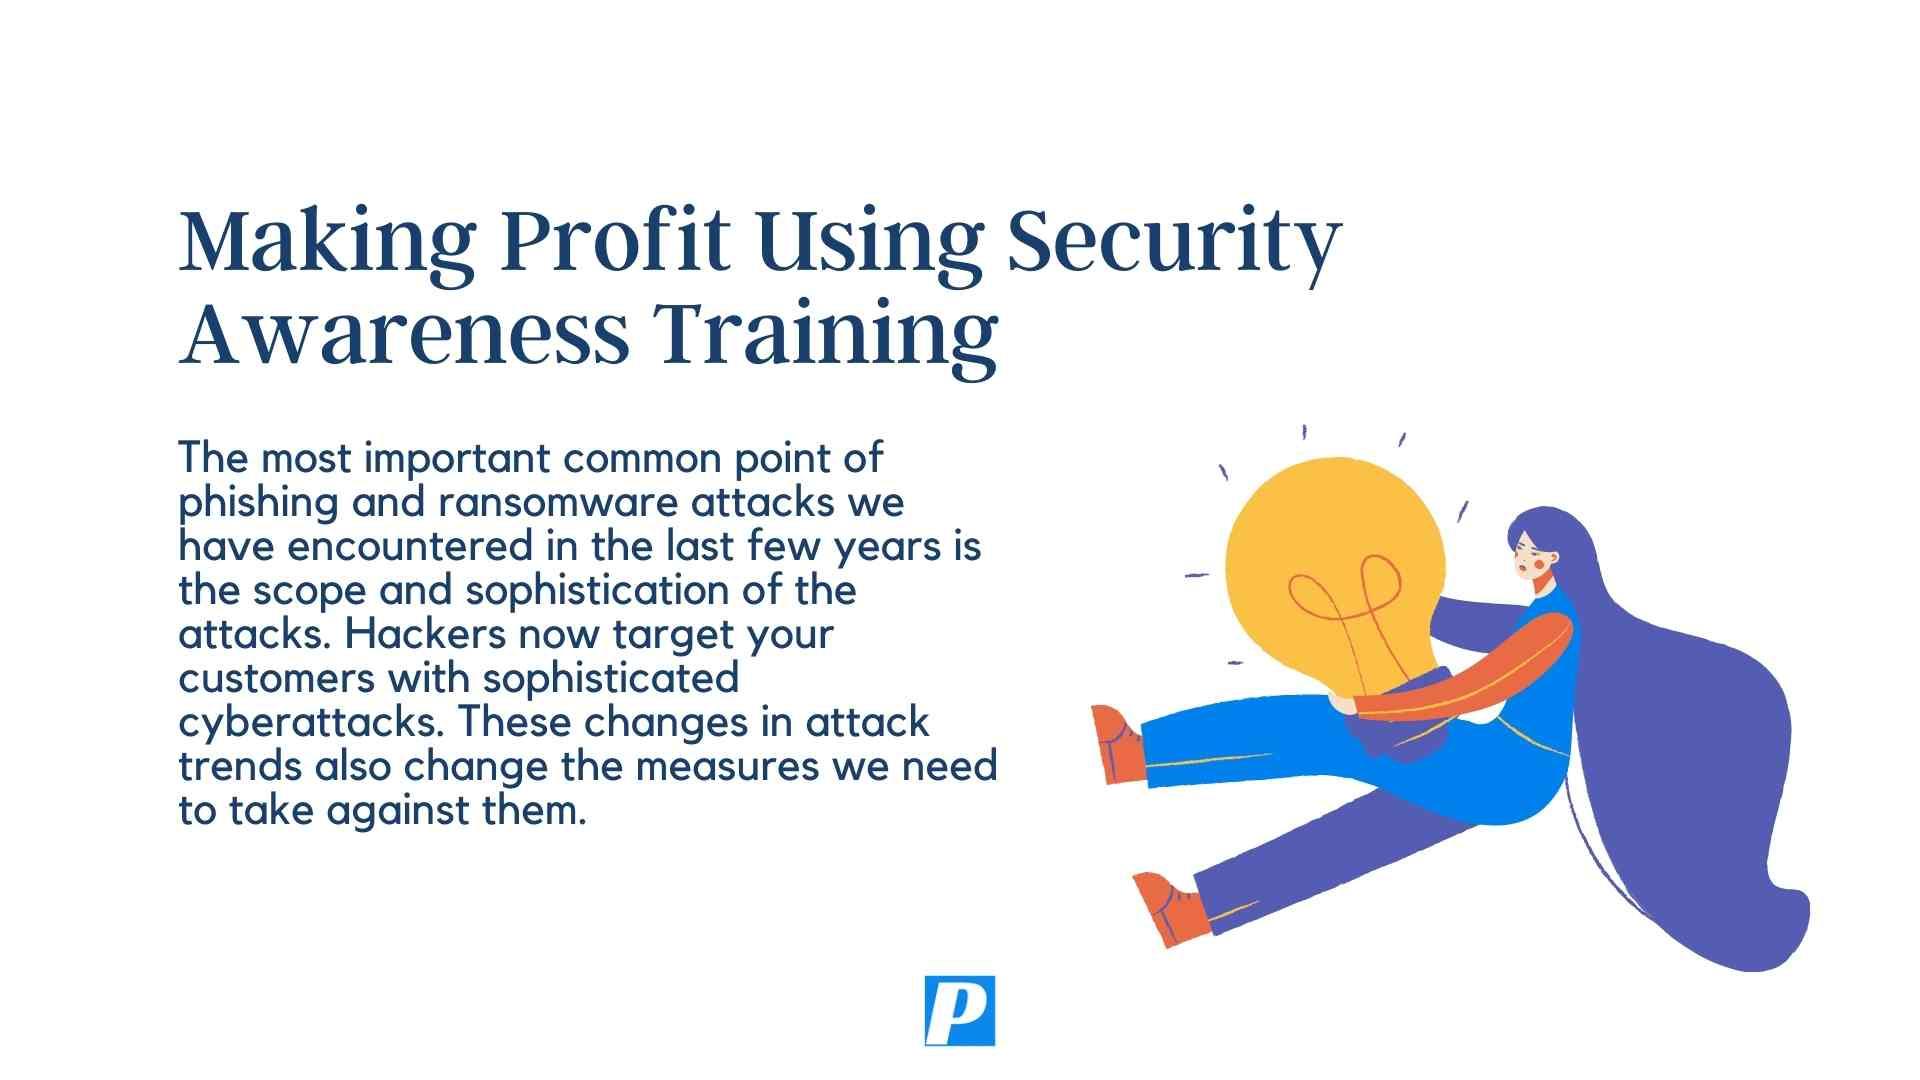 Making Profit Using Cybersecurity Training